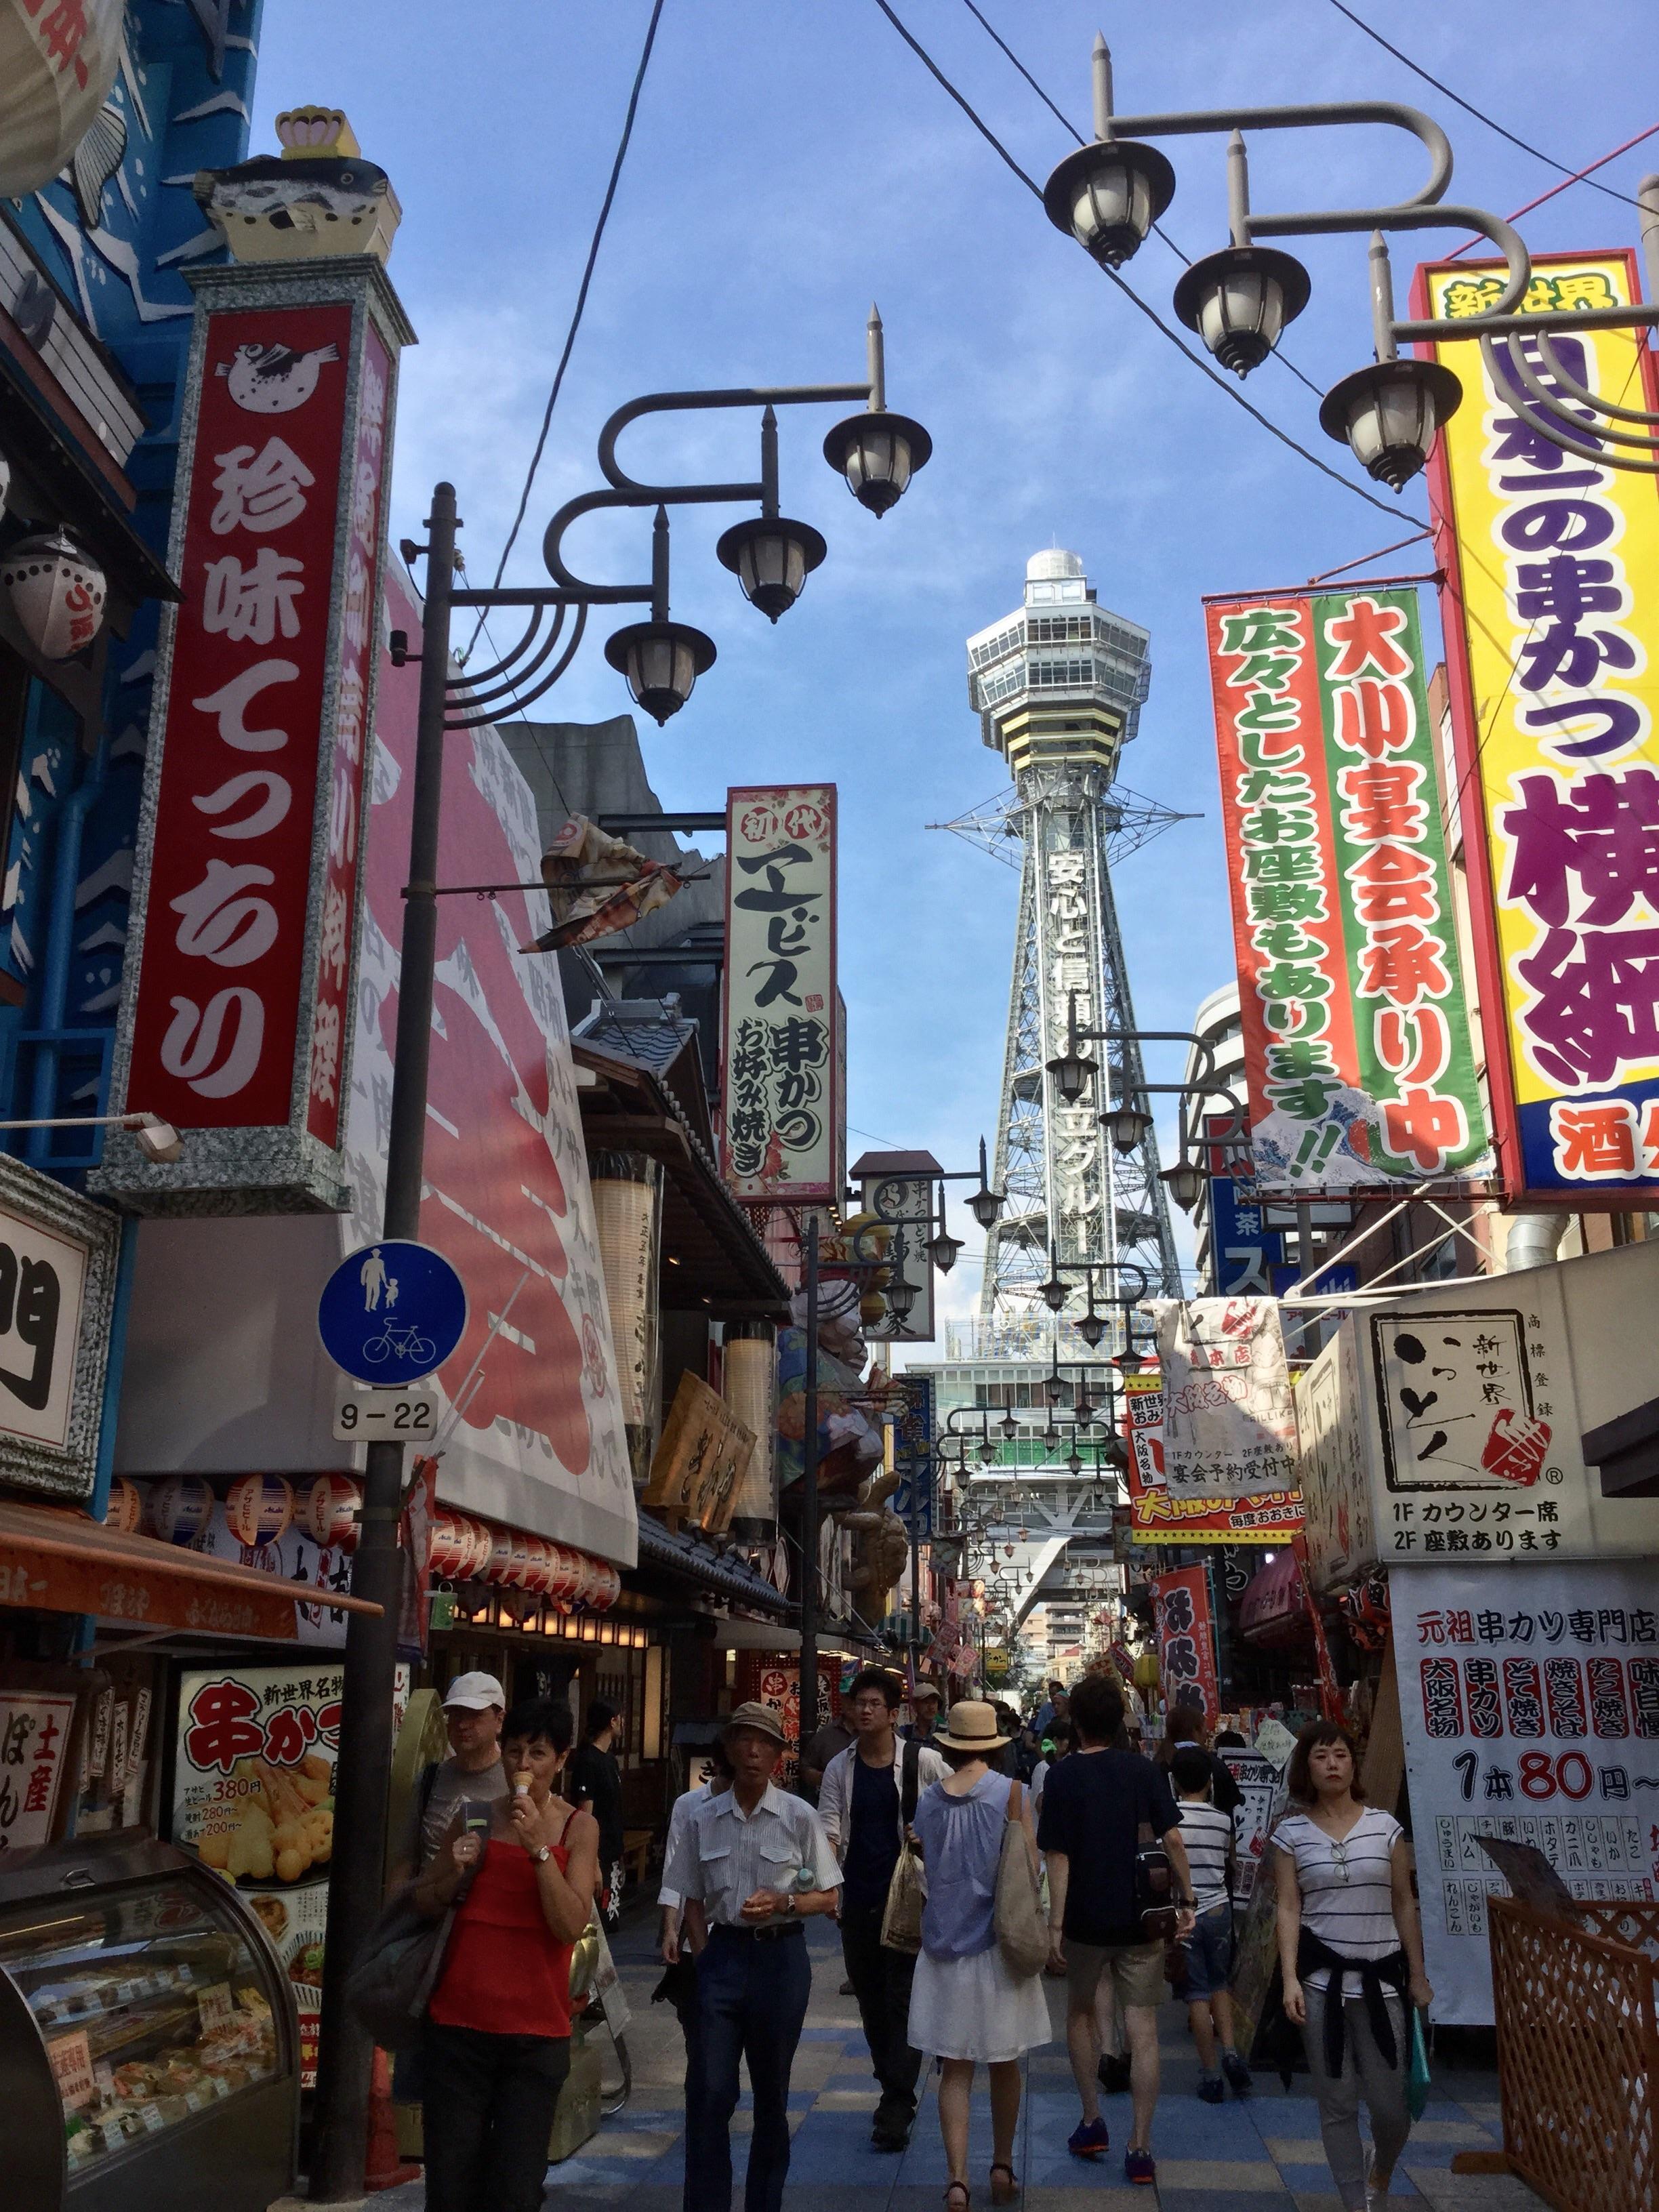 Tsūtenkaku Tower dwarths the Osaka Skyline.